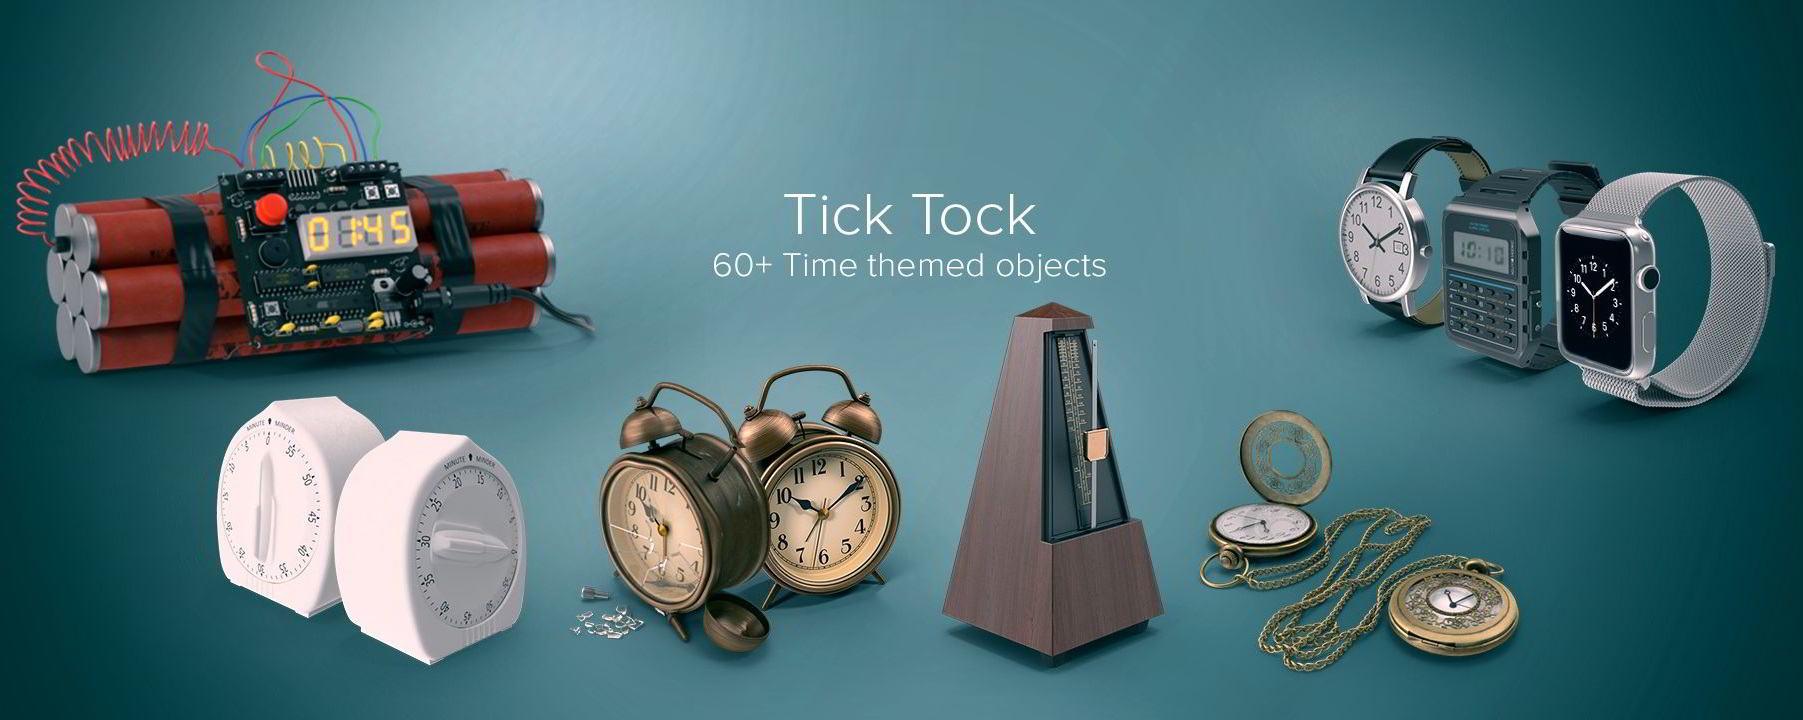 PixelSquid – Tick Tock Collection free download